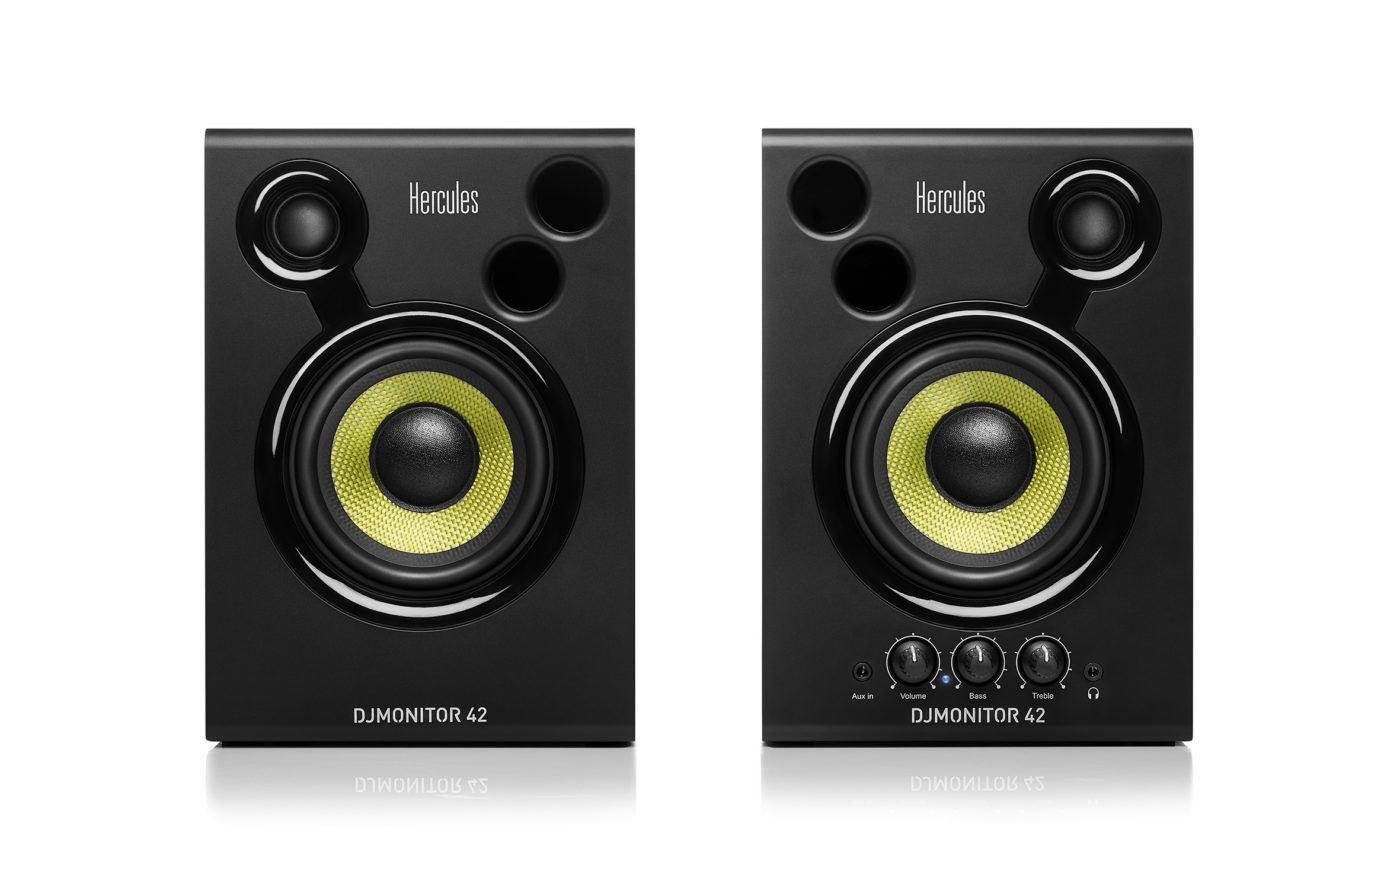 2022026-Hercules-DJMonitor-42-altoparlante-40-W-Nero-Hercules-DJ-Monitor-42-M